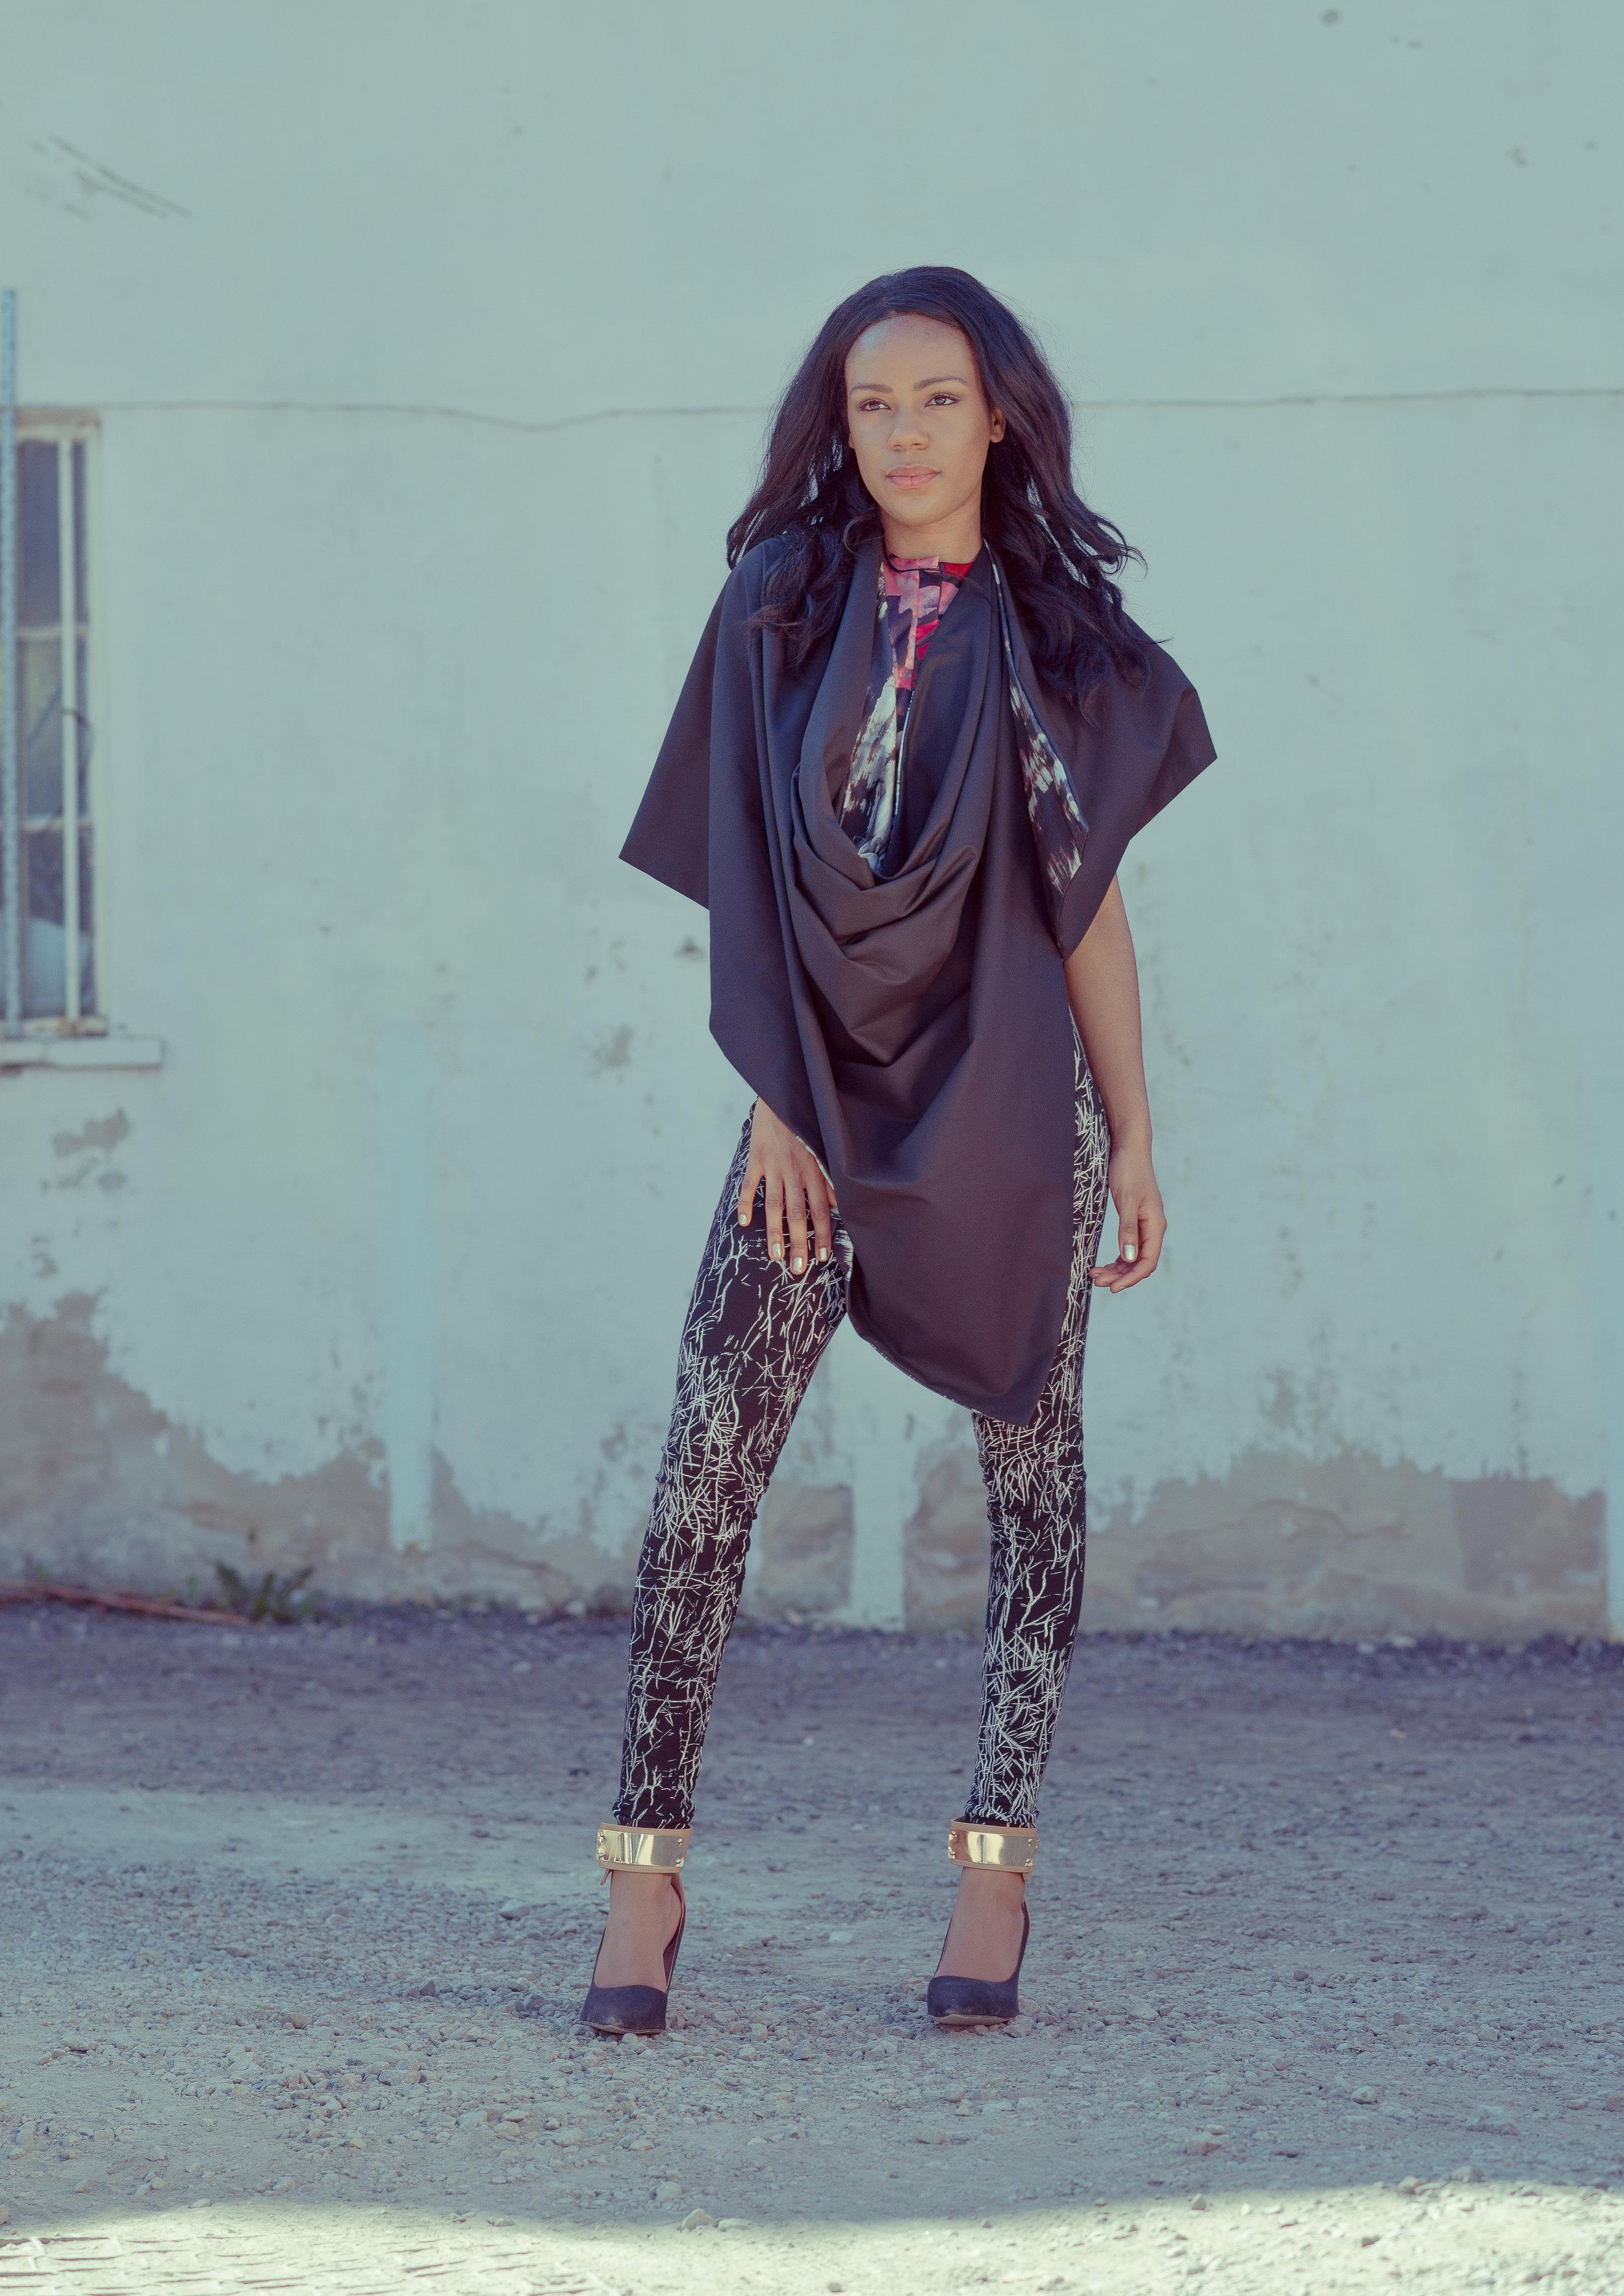 zaramia-ava-zaramiaava-leeds-fashion-designer-ethical-sustainable-tailored-minimalist-cape-grey-black-print-rei-leggigs-black-jacket-belt-point-skirt-versatile-drape-cowl-styling-womenswear-models--9